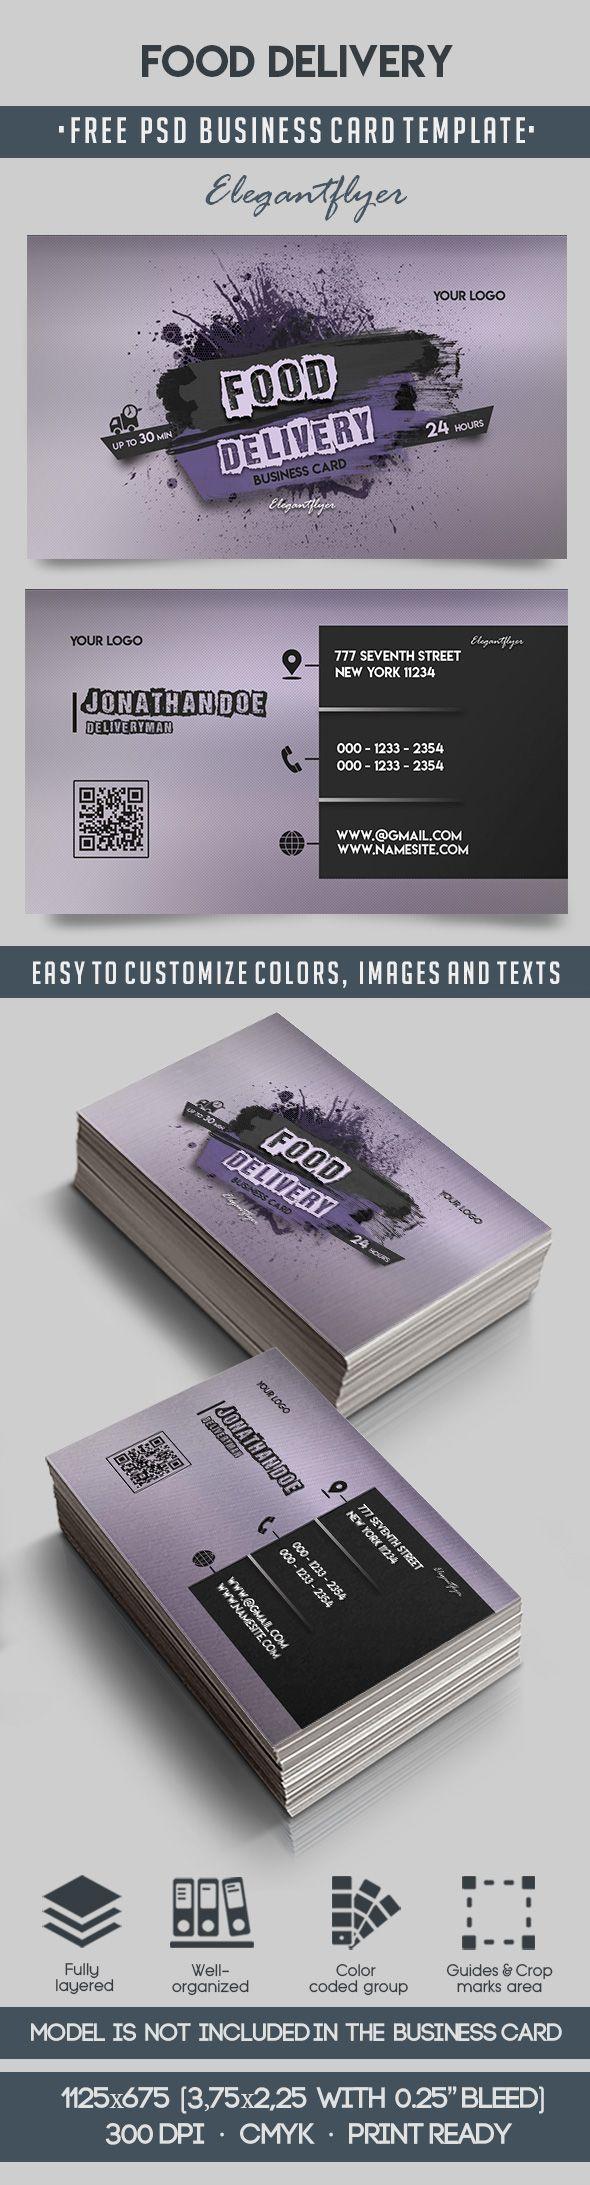 Httpselegantflyerfree business cards templatefood httpselegantflyerfree business cards reheart Choice Image